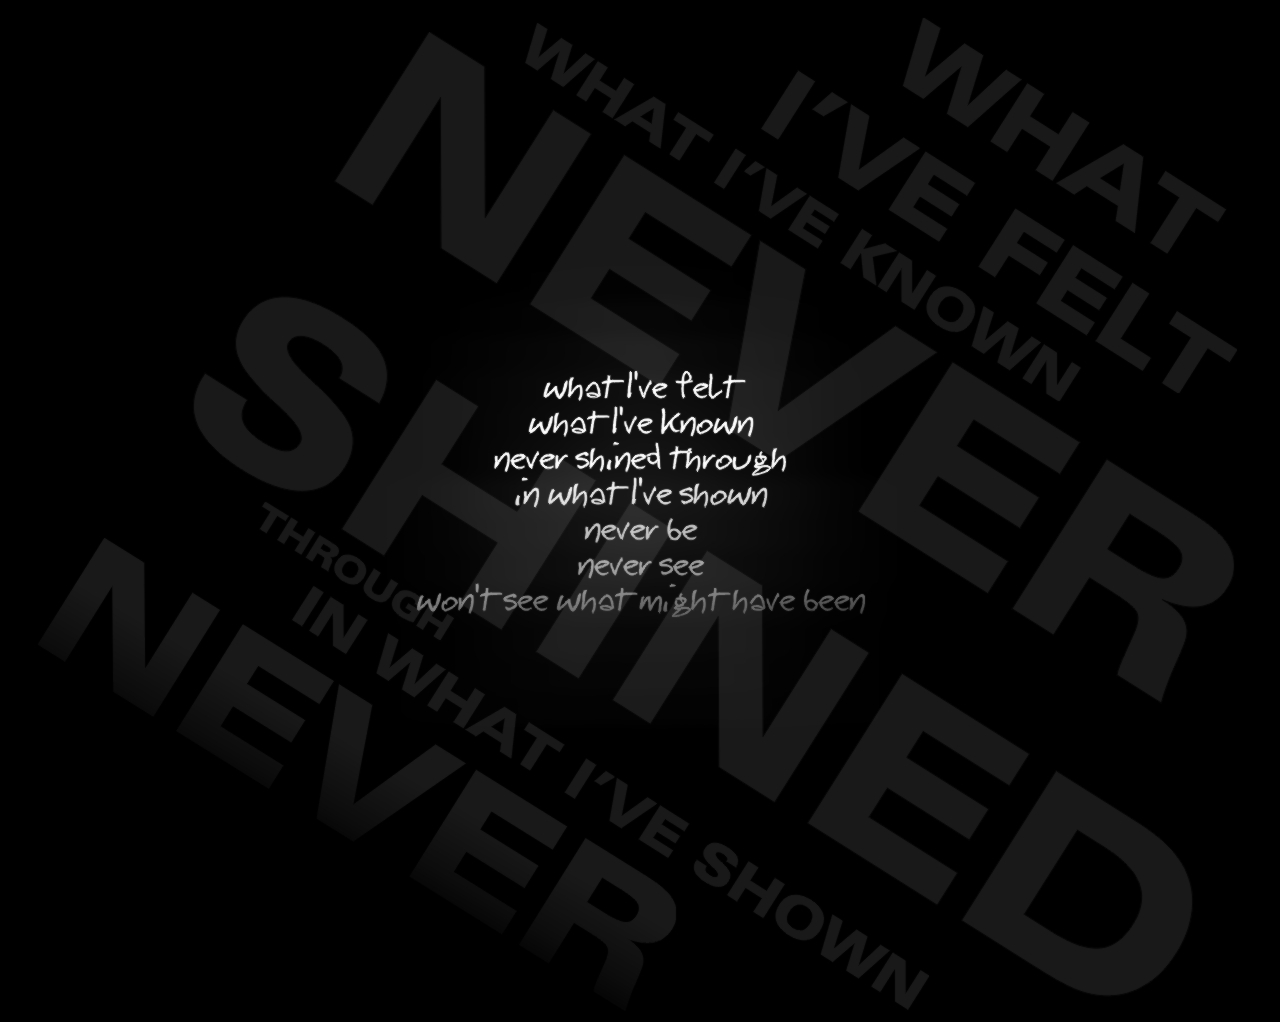 Famous quotes about 'Metallica' - QuotationOf . COM